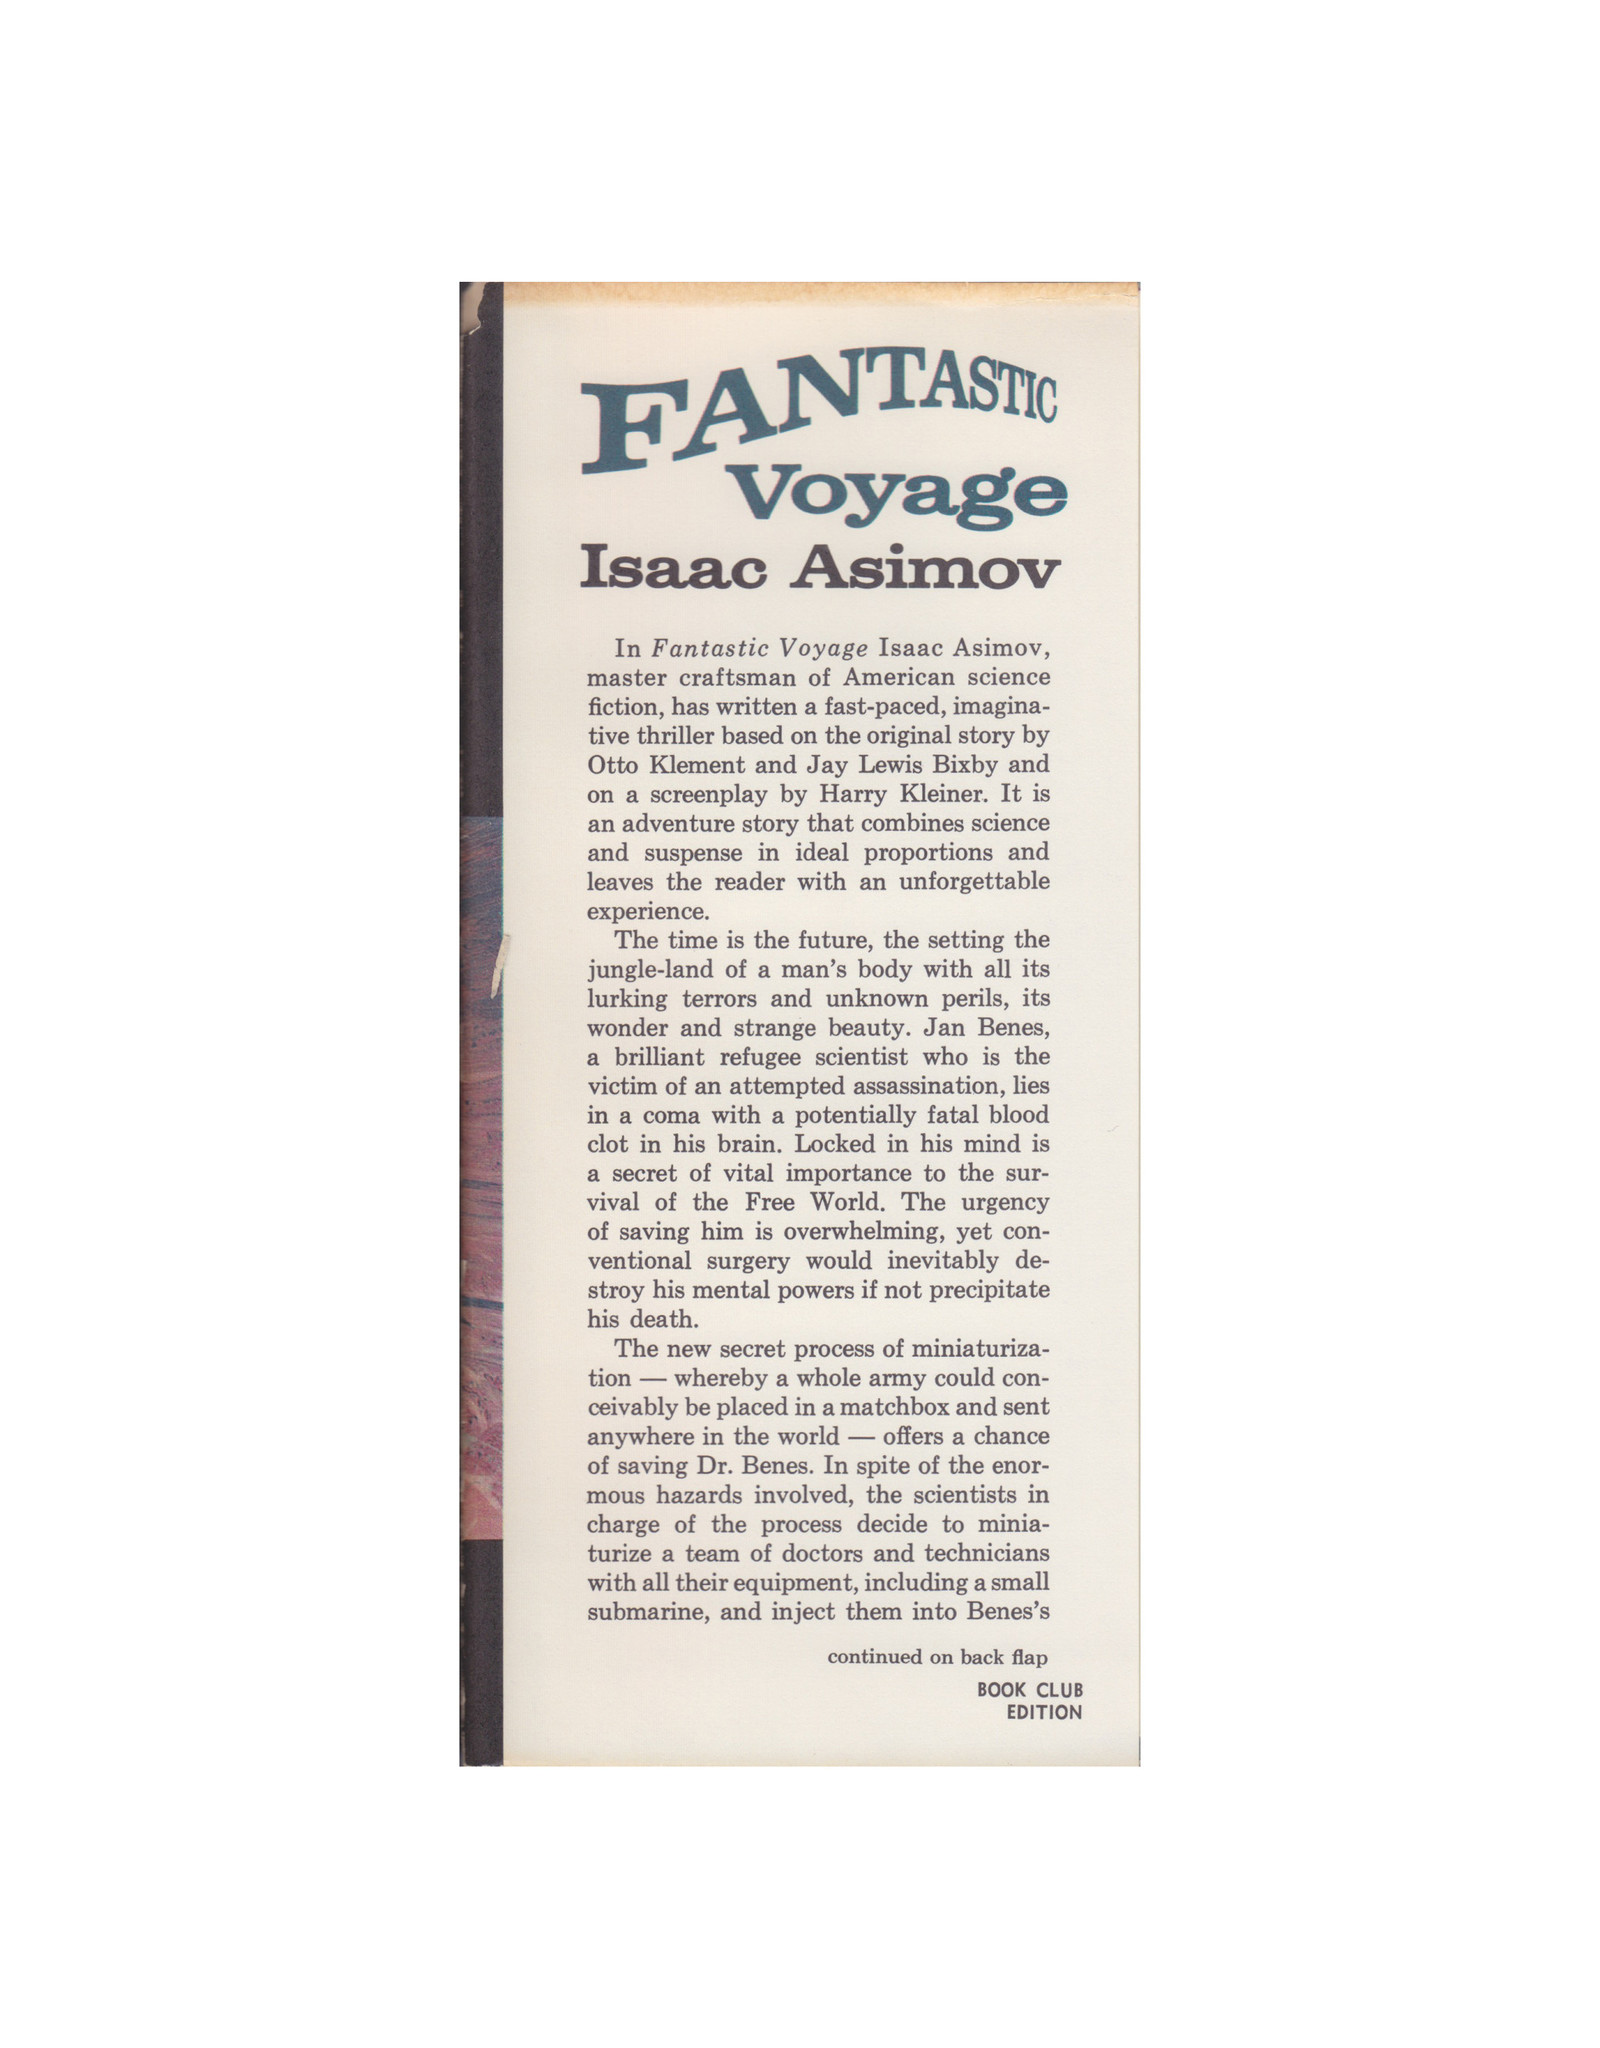 Houghton Mifflin Co. Fantastic Voyage